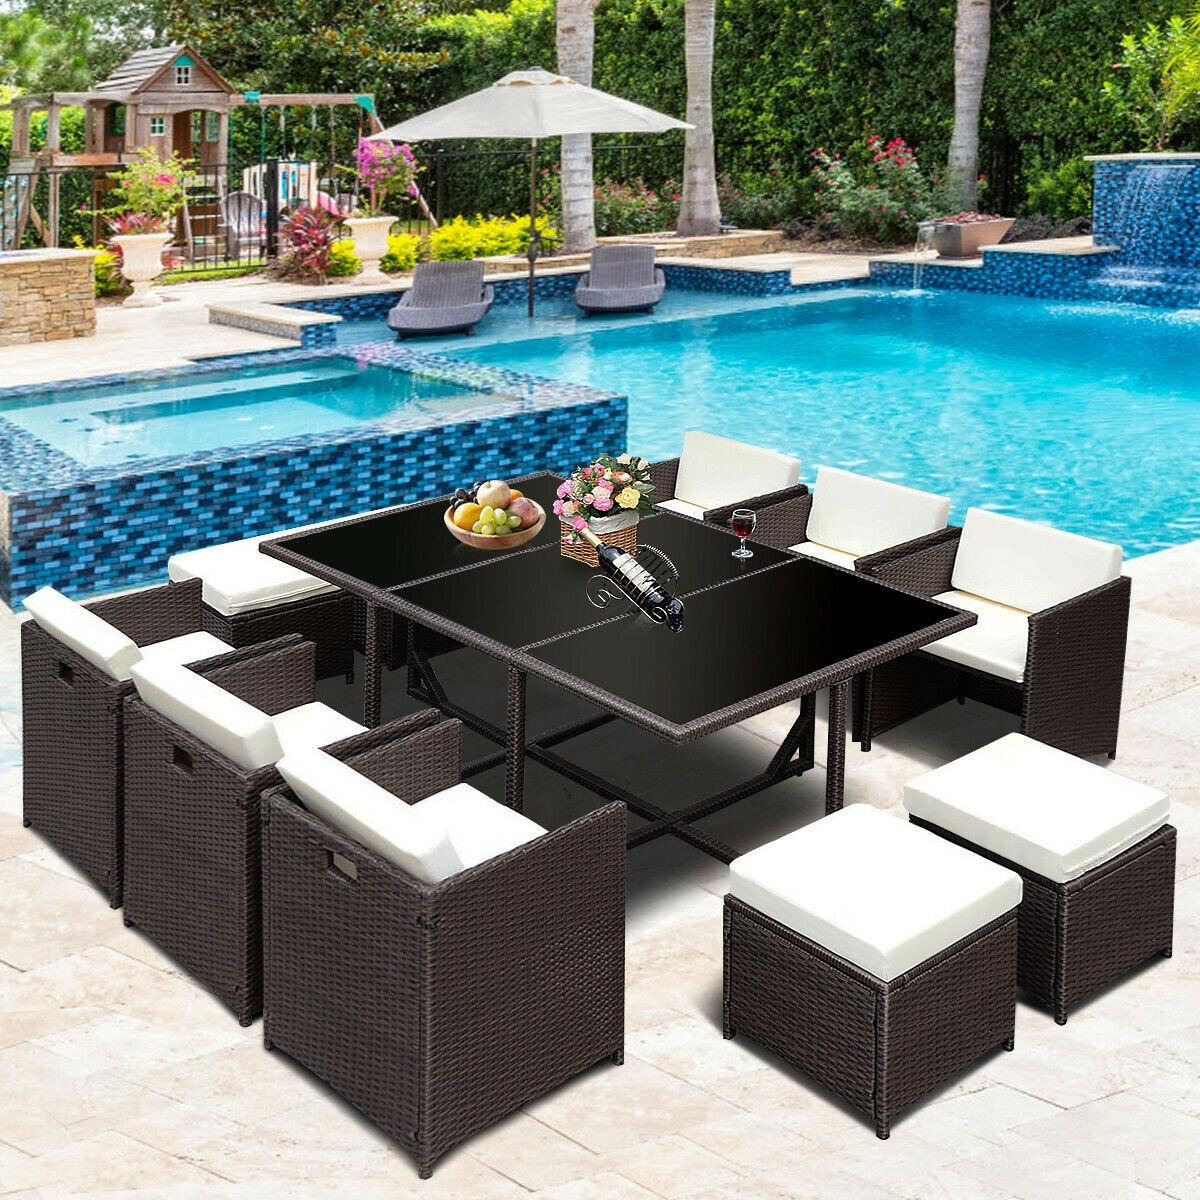 11 pcs Wicker Rattan Patio Outdoor Dinning Cushion Seat